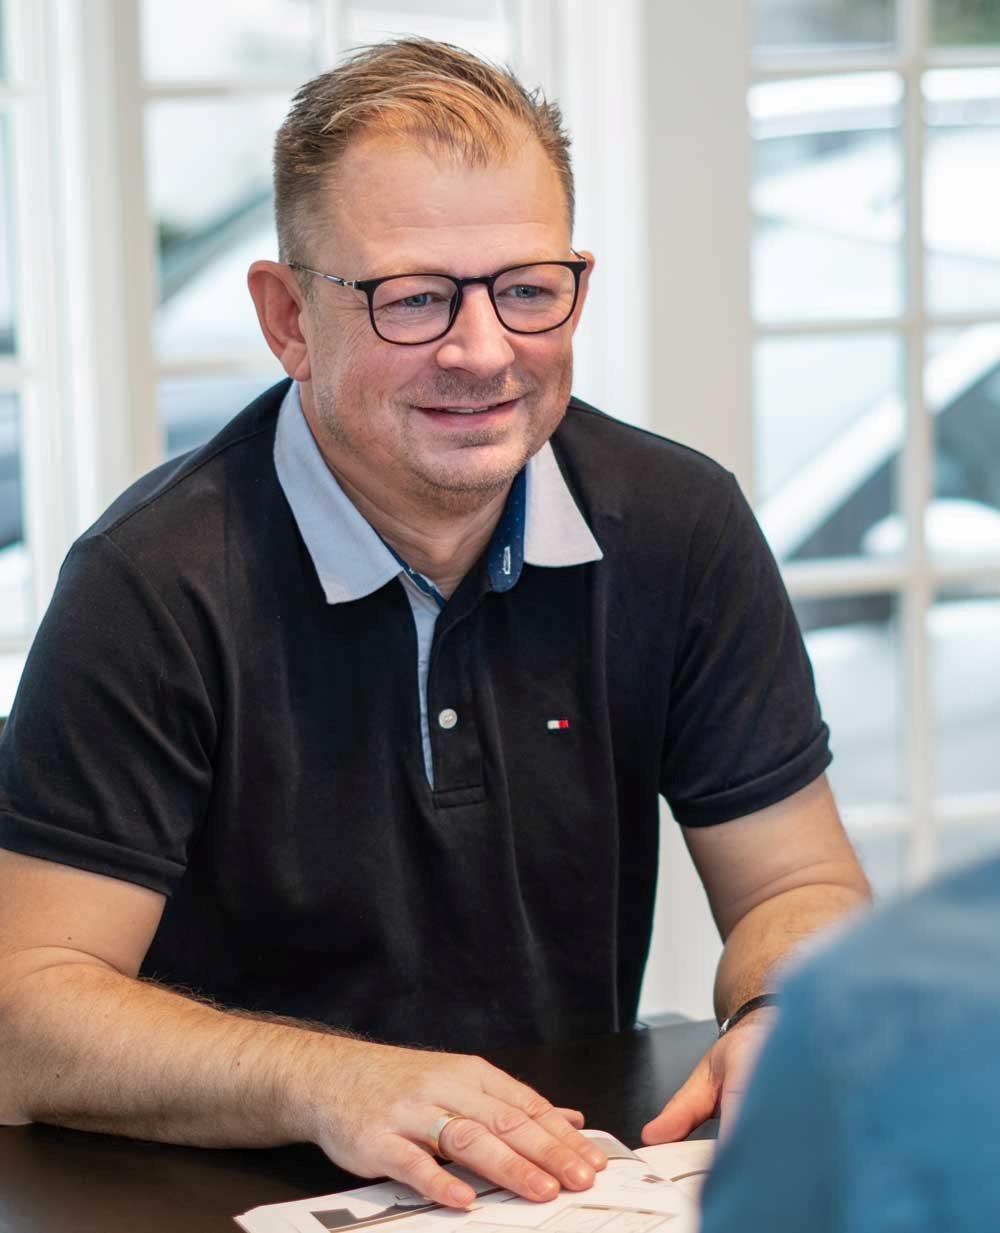 Jan Drejer Pedersen